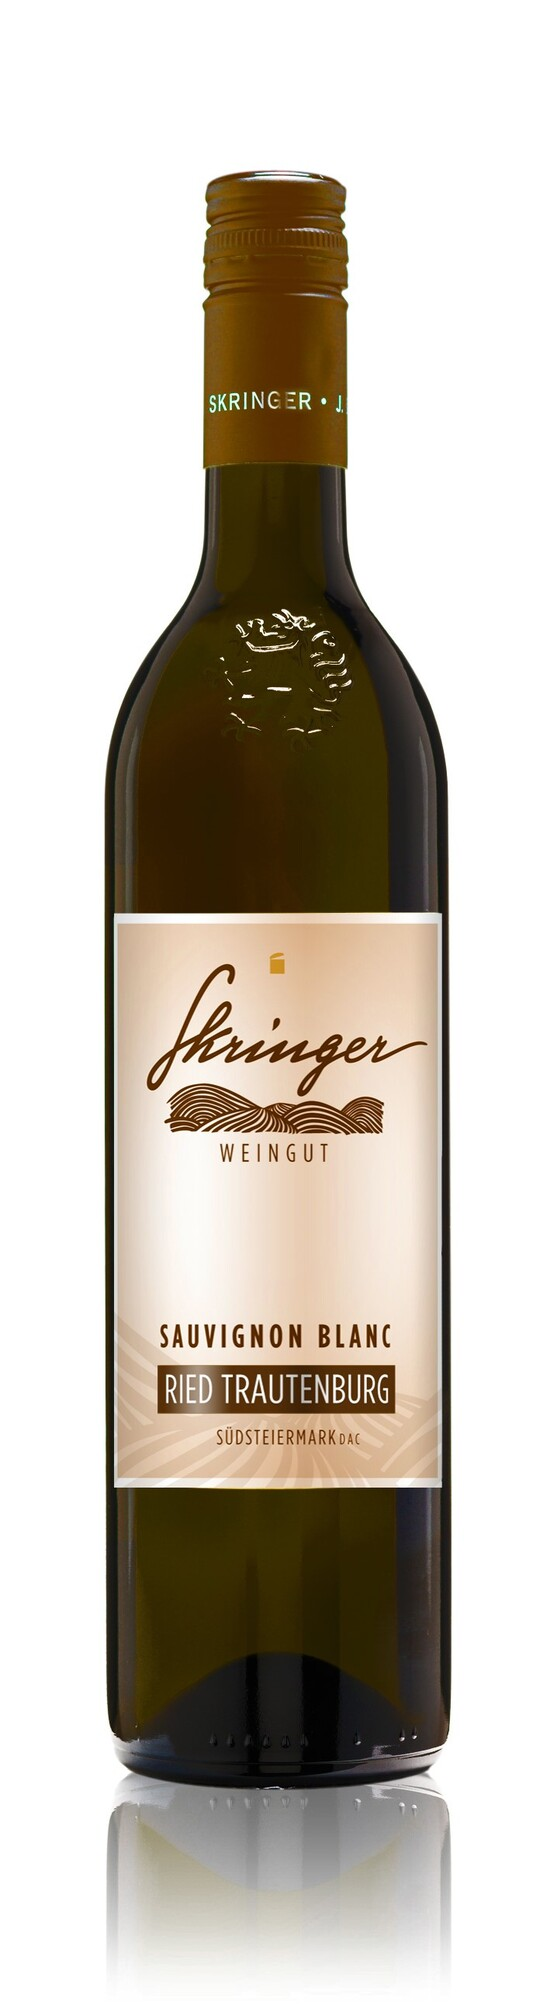 Sauvignon blanc Ried Trautenburg 2019, 0,75l